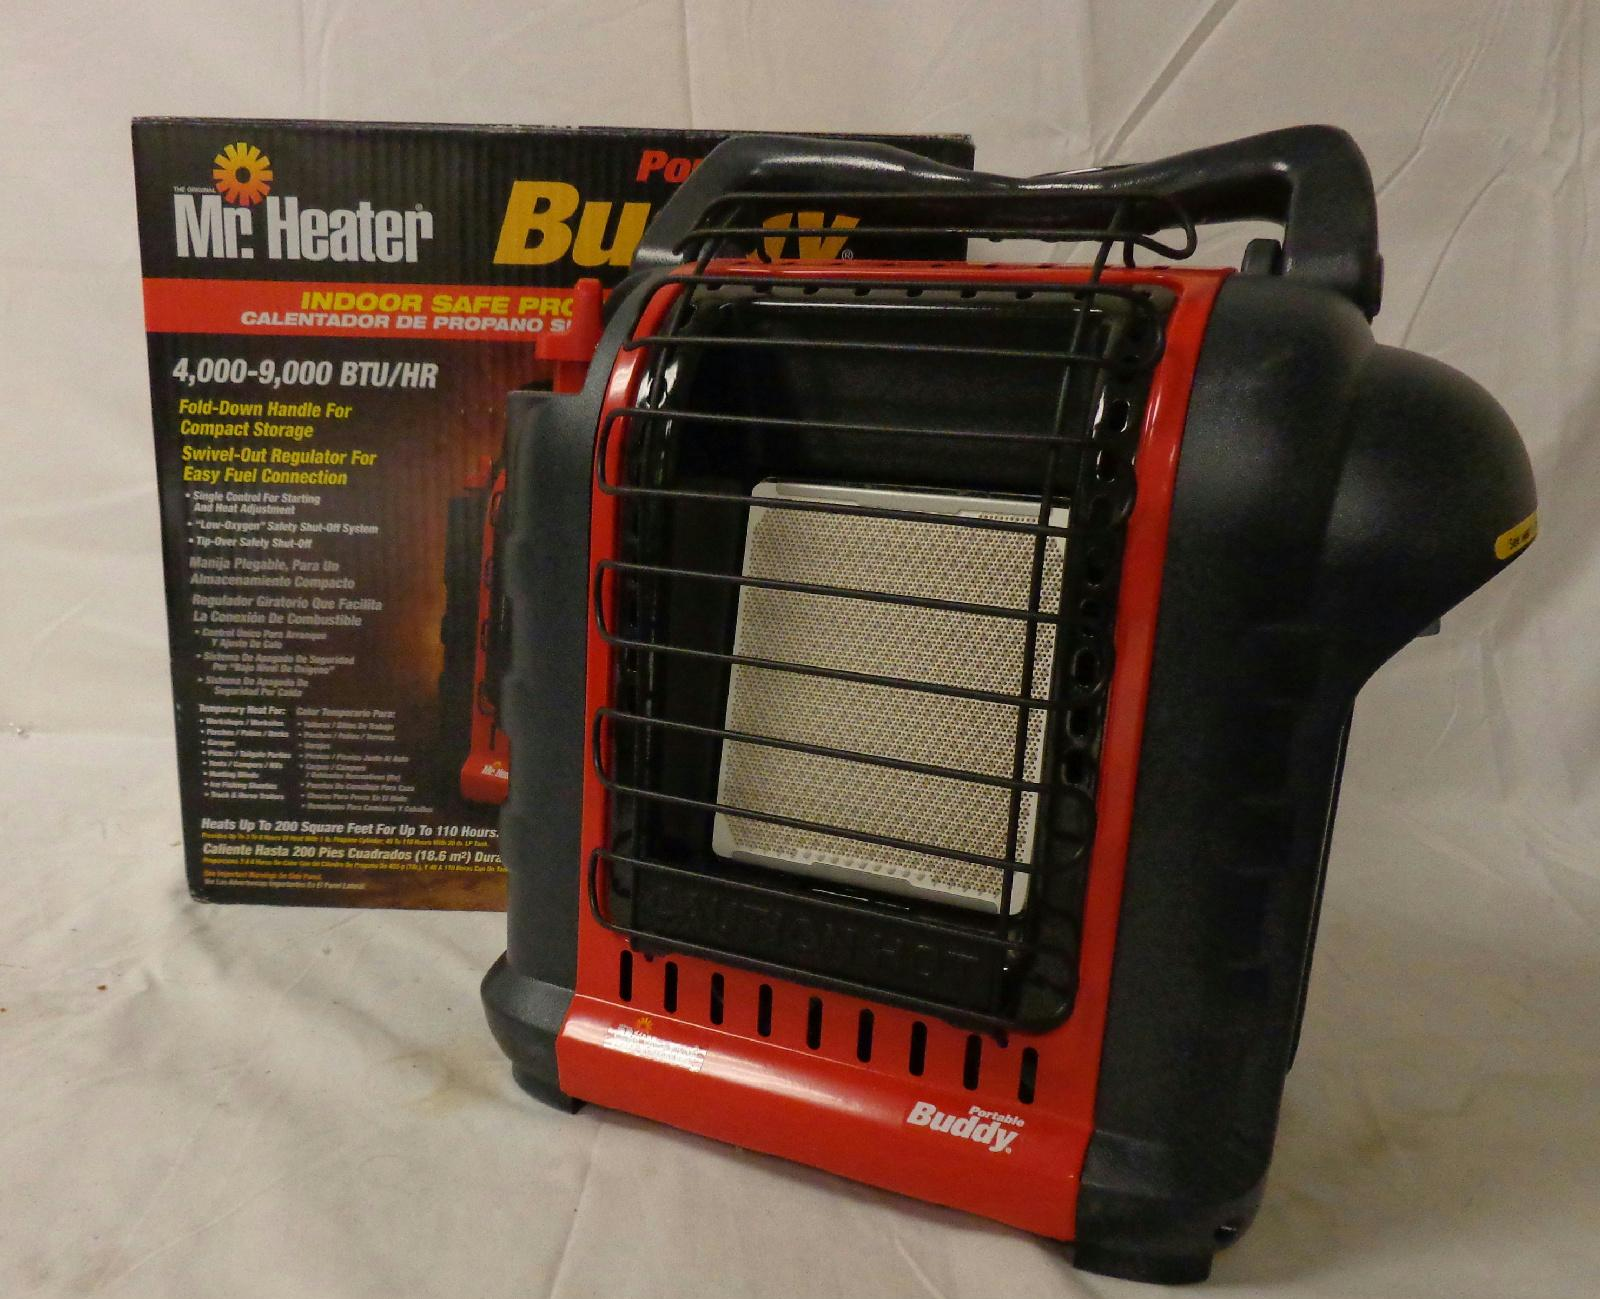 Mr Heater Portable Buddy Deals On 1001 Blocks